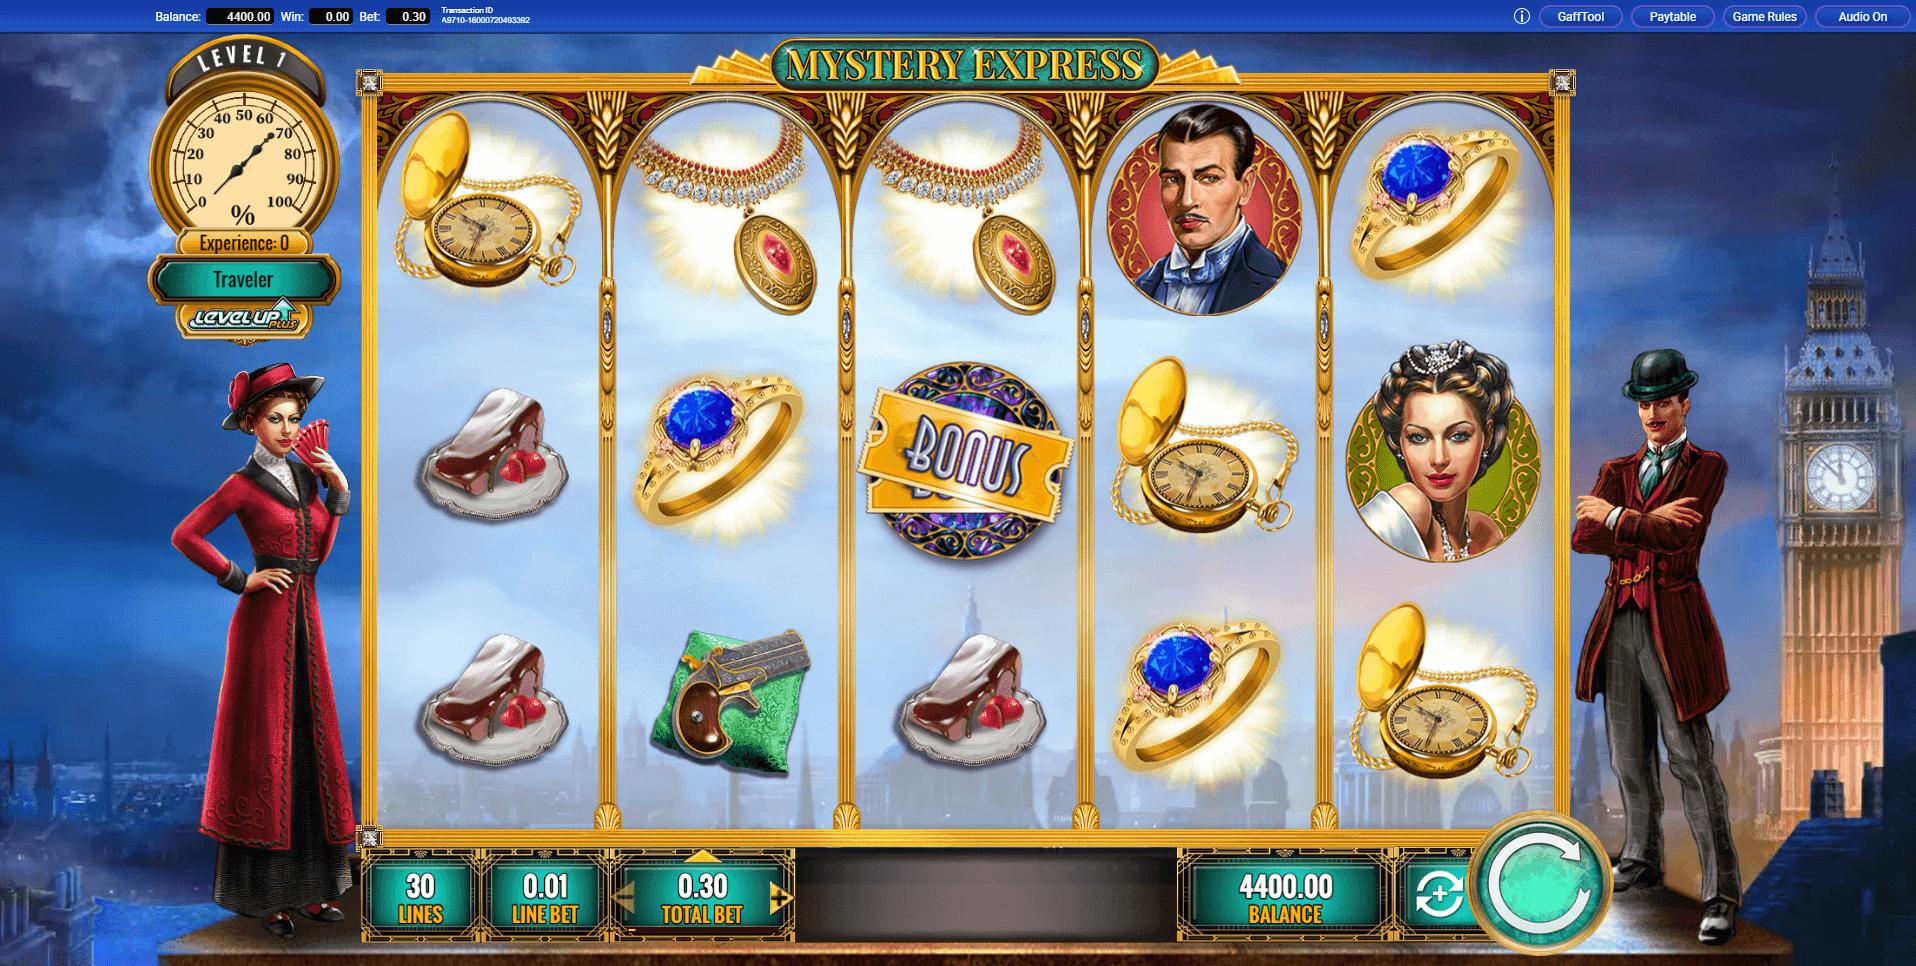 Mystery Express slot machine screenshot